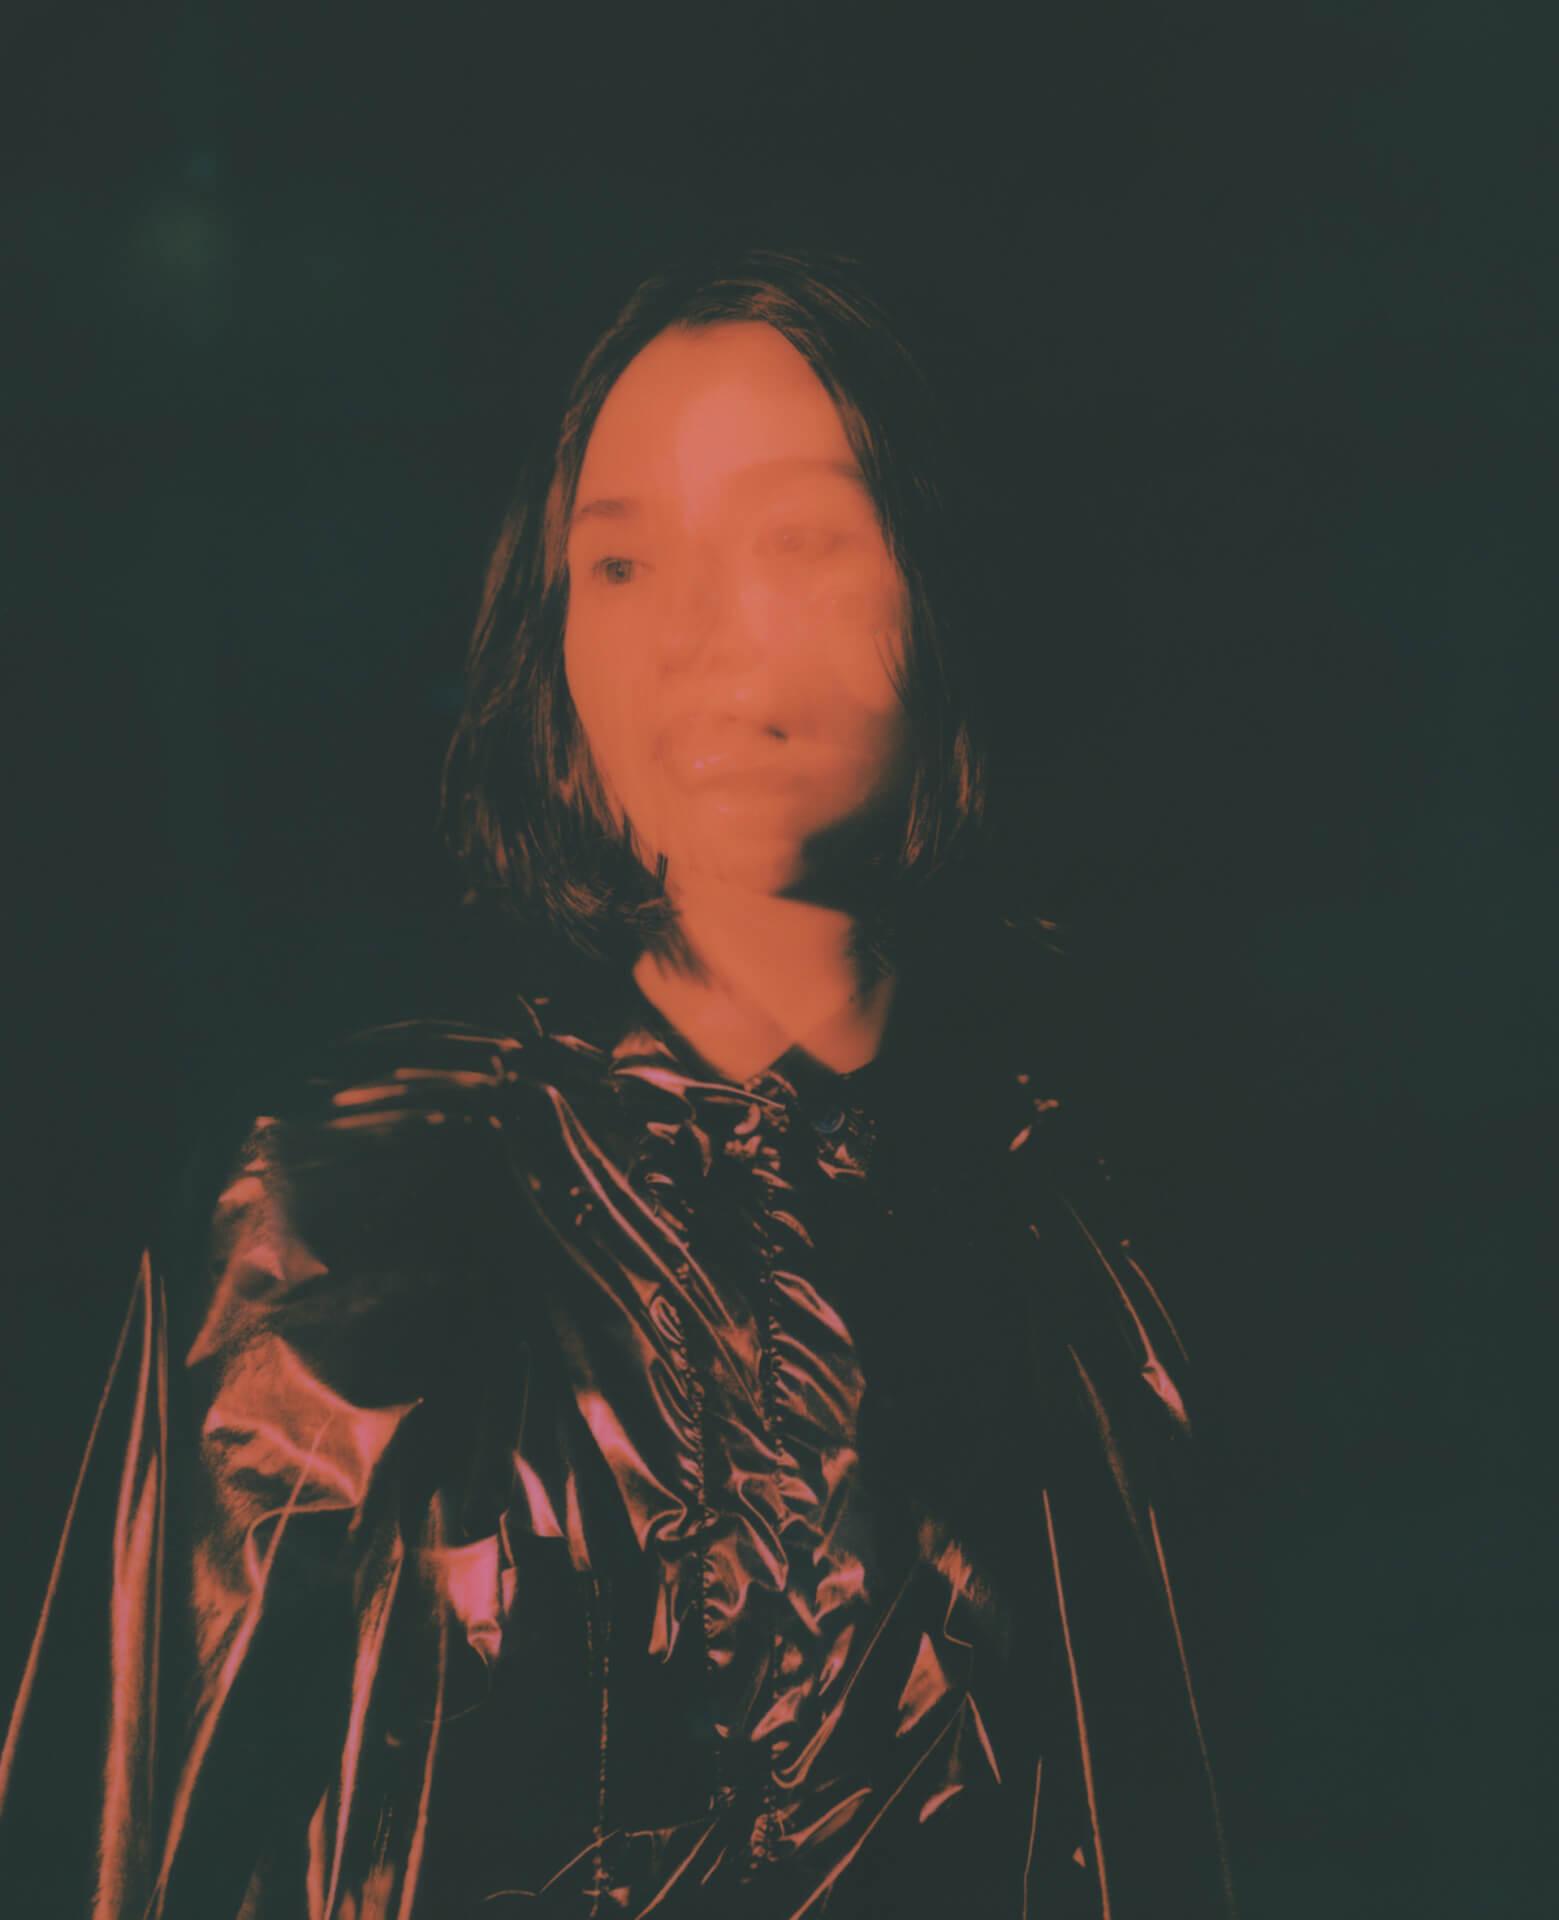 "Black Boboiのメンバー、Julia Shortreed初のアルバム『Violet Sun』が発売決定|先行曲""Wild Rose""がリリース&Tatsuya FujimotoによるMVも解禁 music210108_juliashortreed_2"